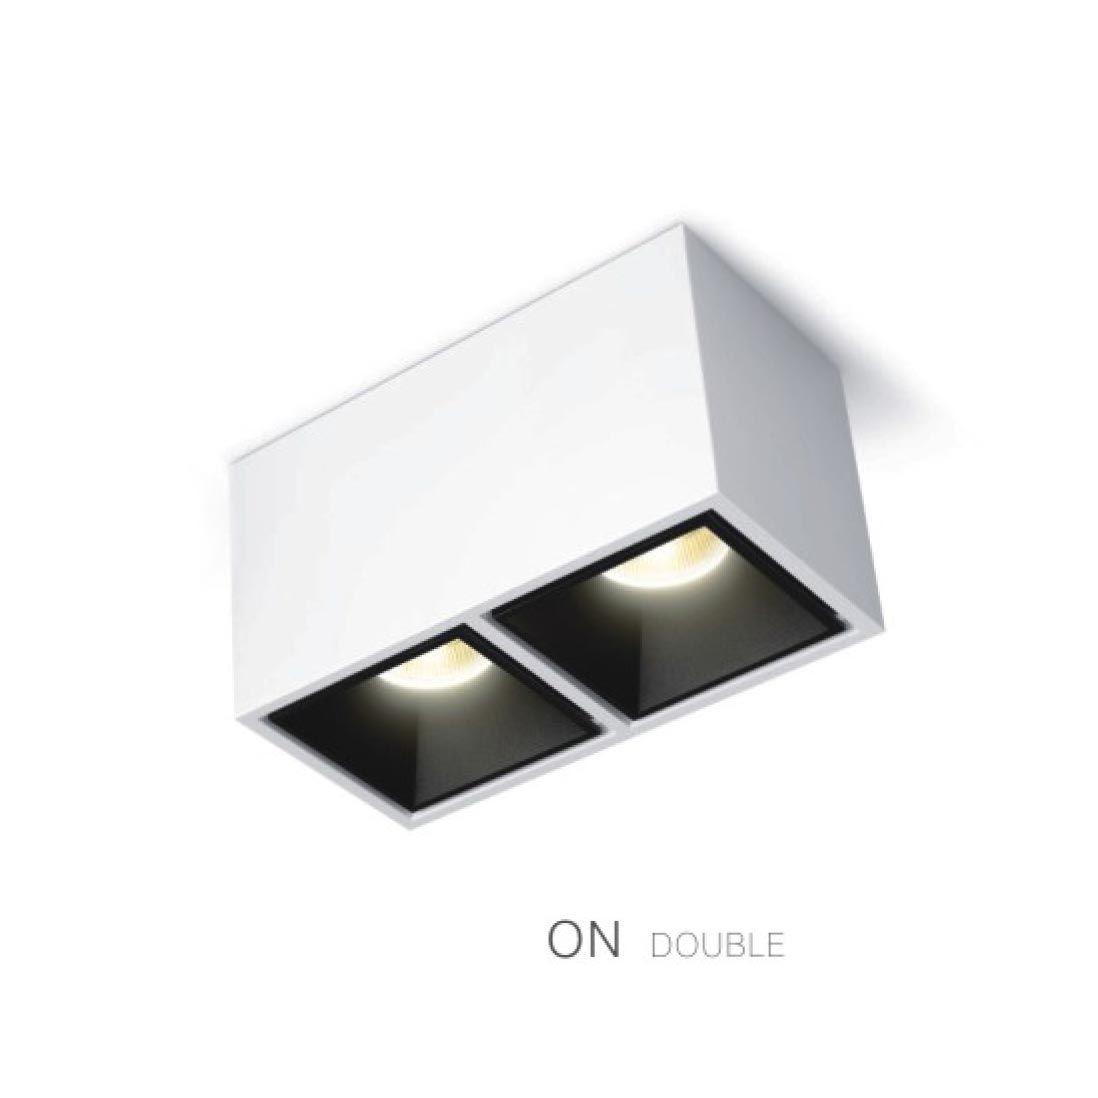 Cubic Shape Spotlight It Is A Modern Double Spotlight Lighting Fixture For Nice Apartm Lighting Design Interior Spotlight Lighting Contemporary Light Fixtures